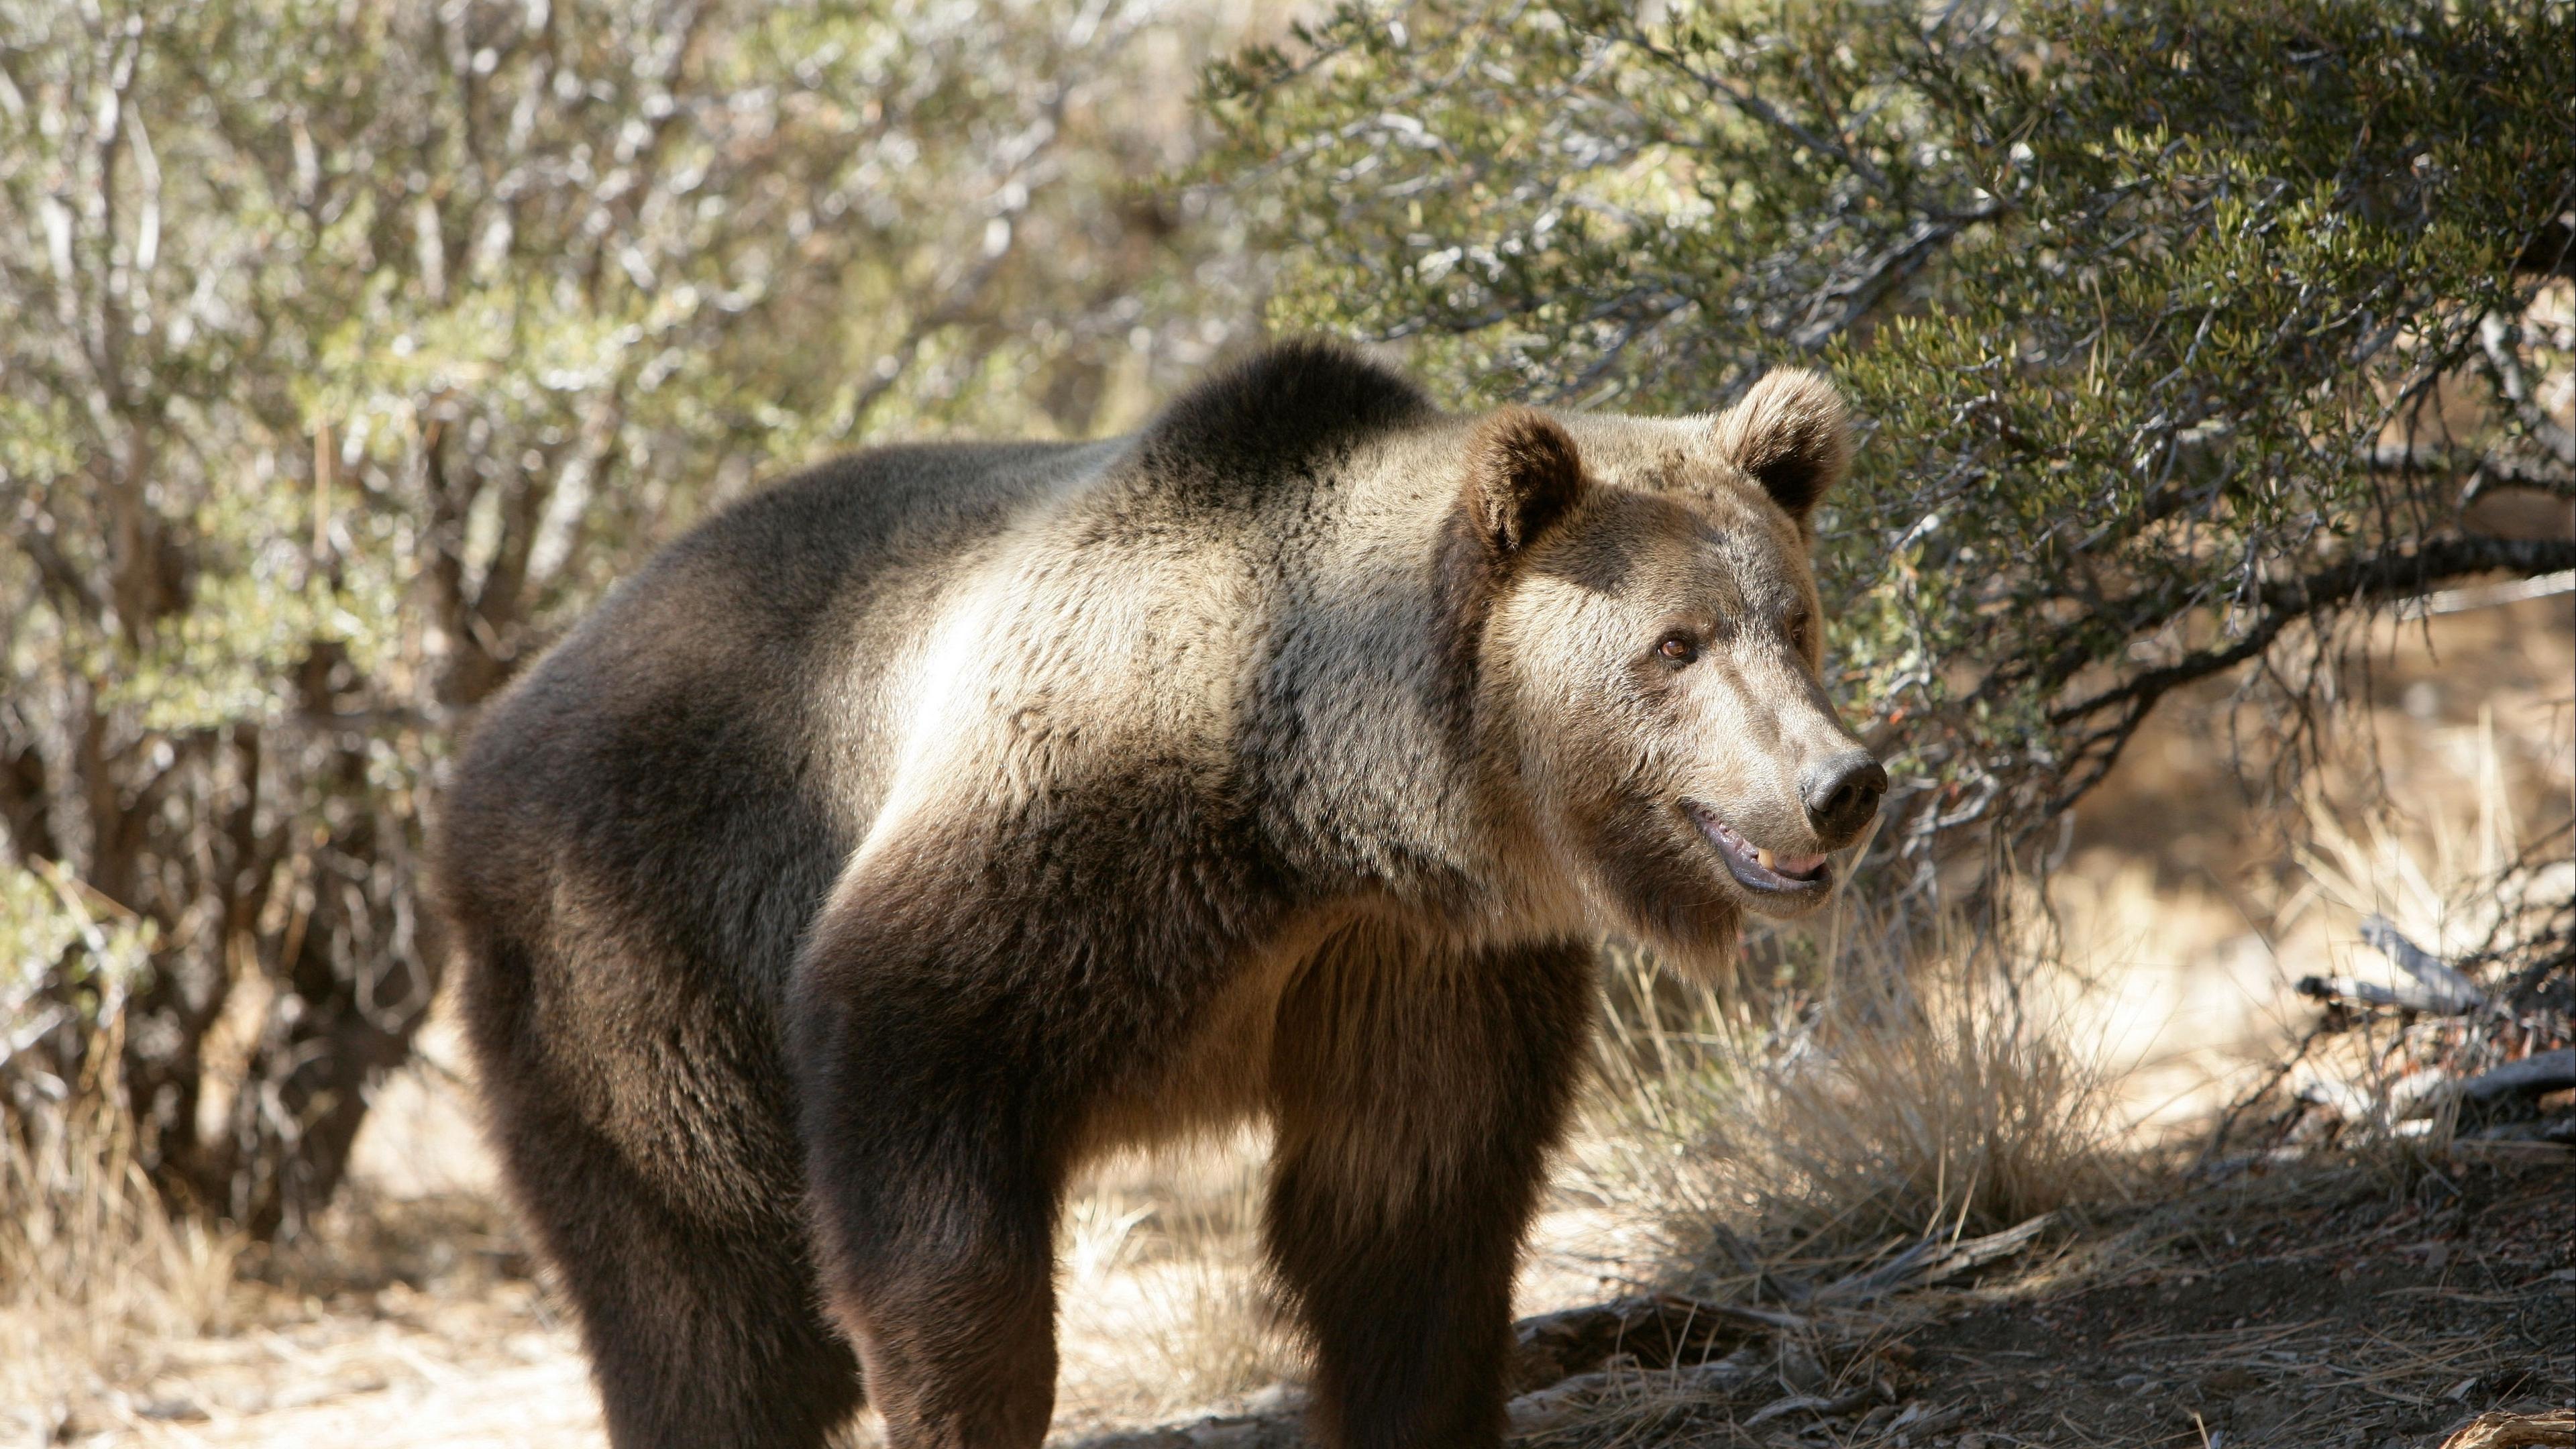 bear grass trees rocks walk 4k 1542242304 - bear, grass, trees, rocks, walk 4k - Trees, Grass, Bear